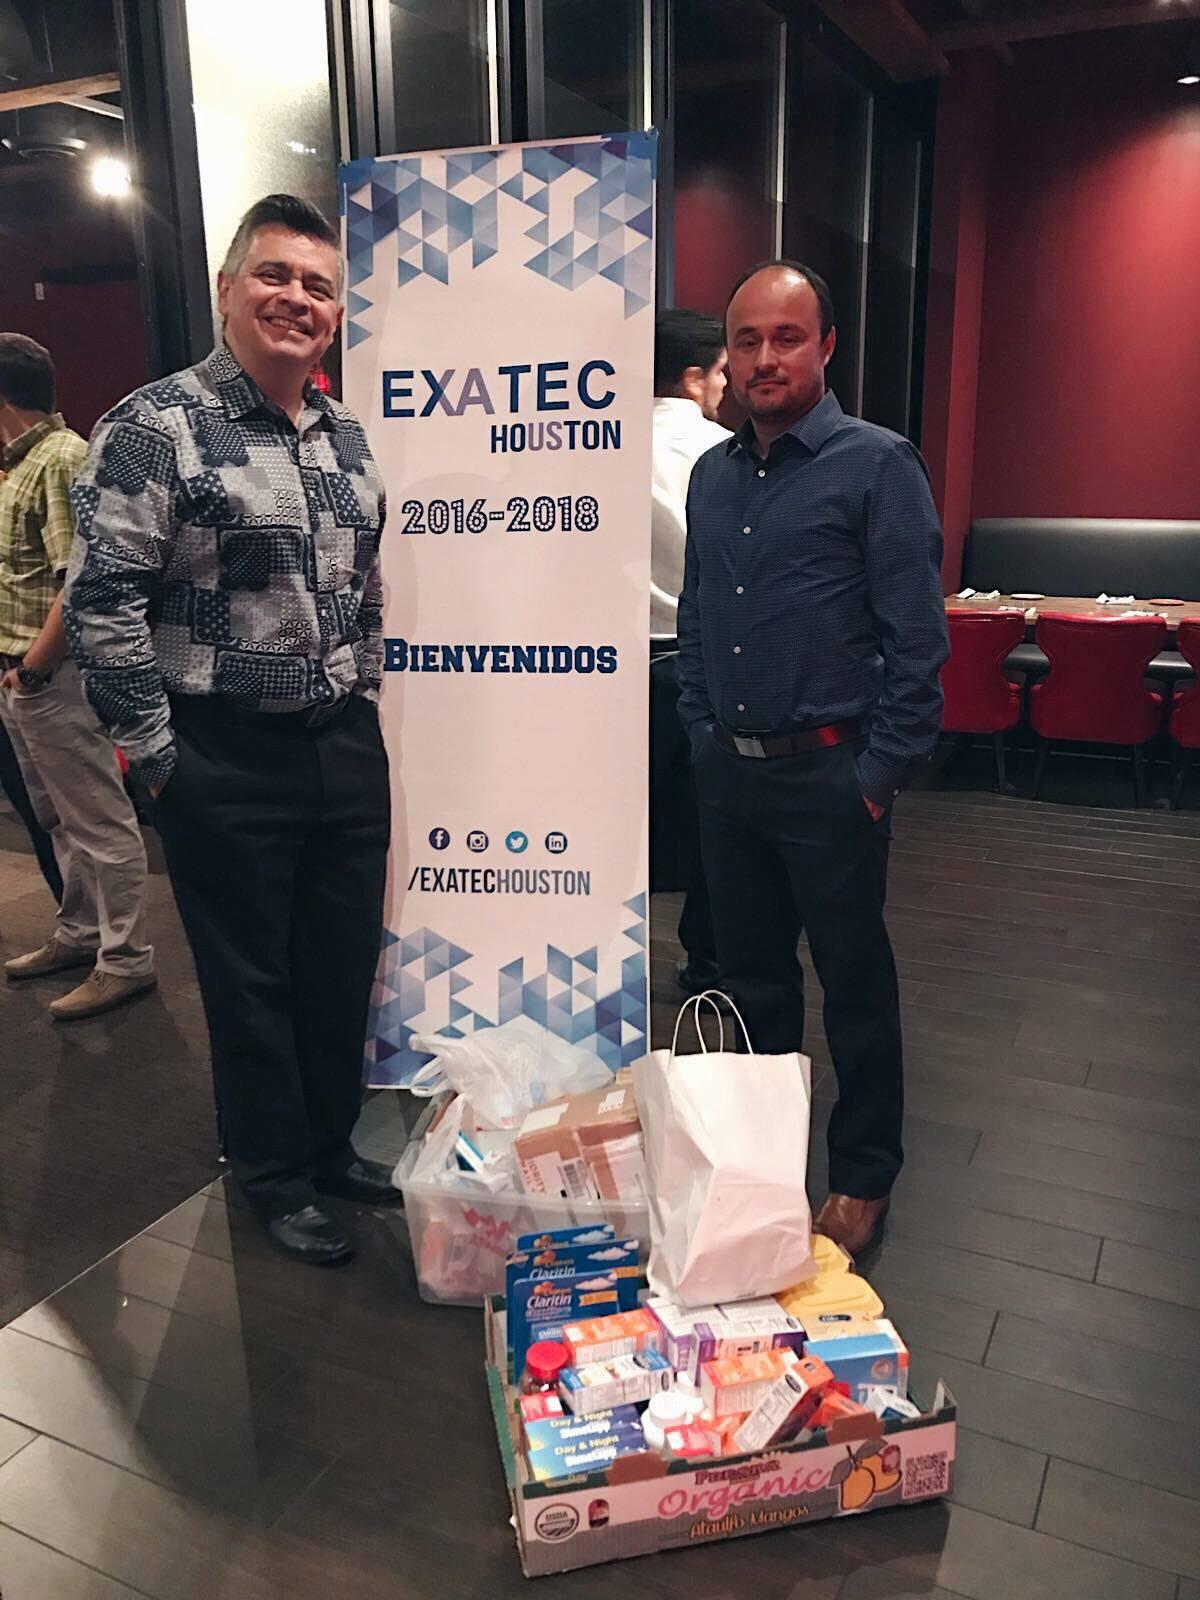 Exatec Houston - The Exatec Houston community generously held a donation drive to collect needed medicine for children in Venezuela. Gracias!